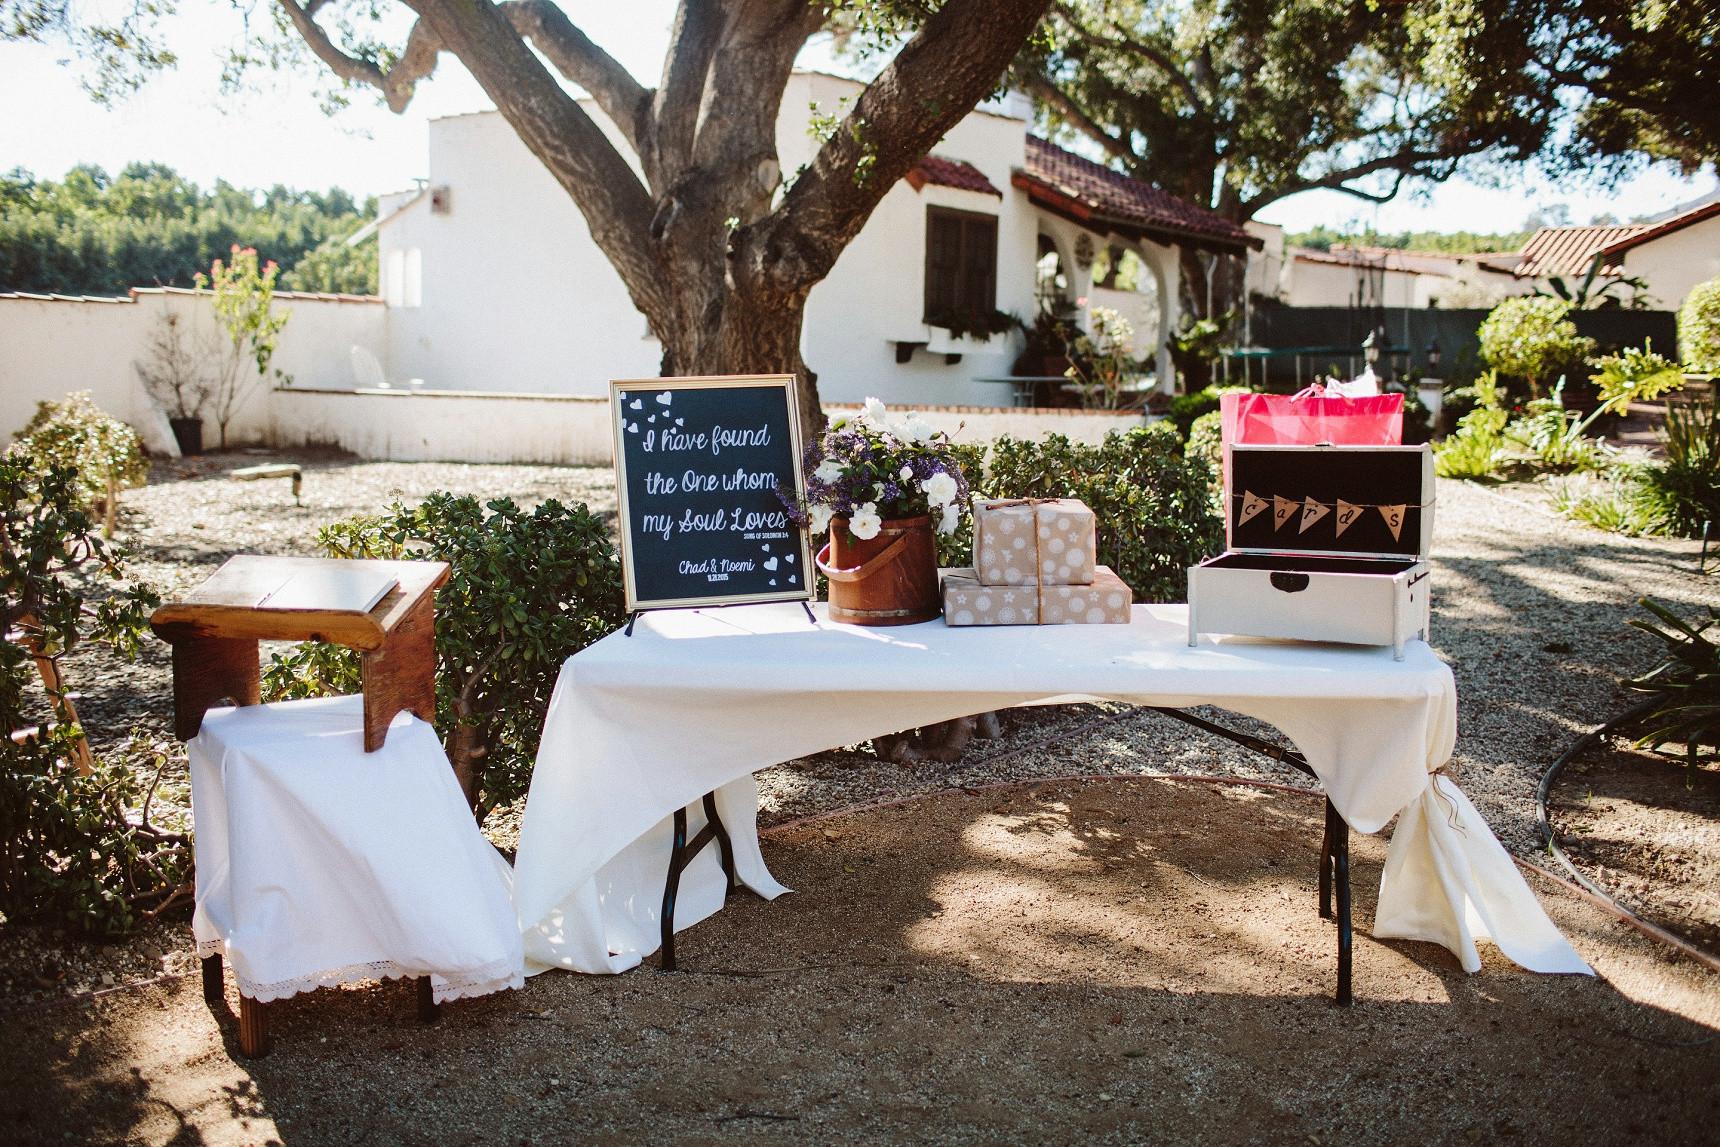 Best ideas about DIY Backyard Wedding . Save or Pin DIY Backyard Wedding Ventura Wedding grapher Now.